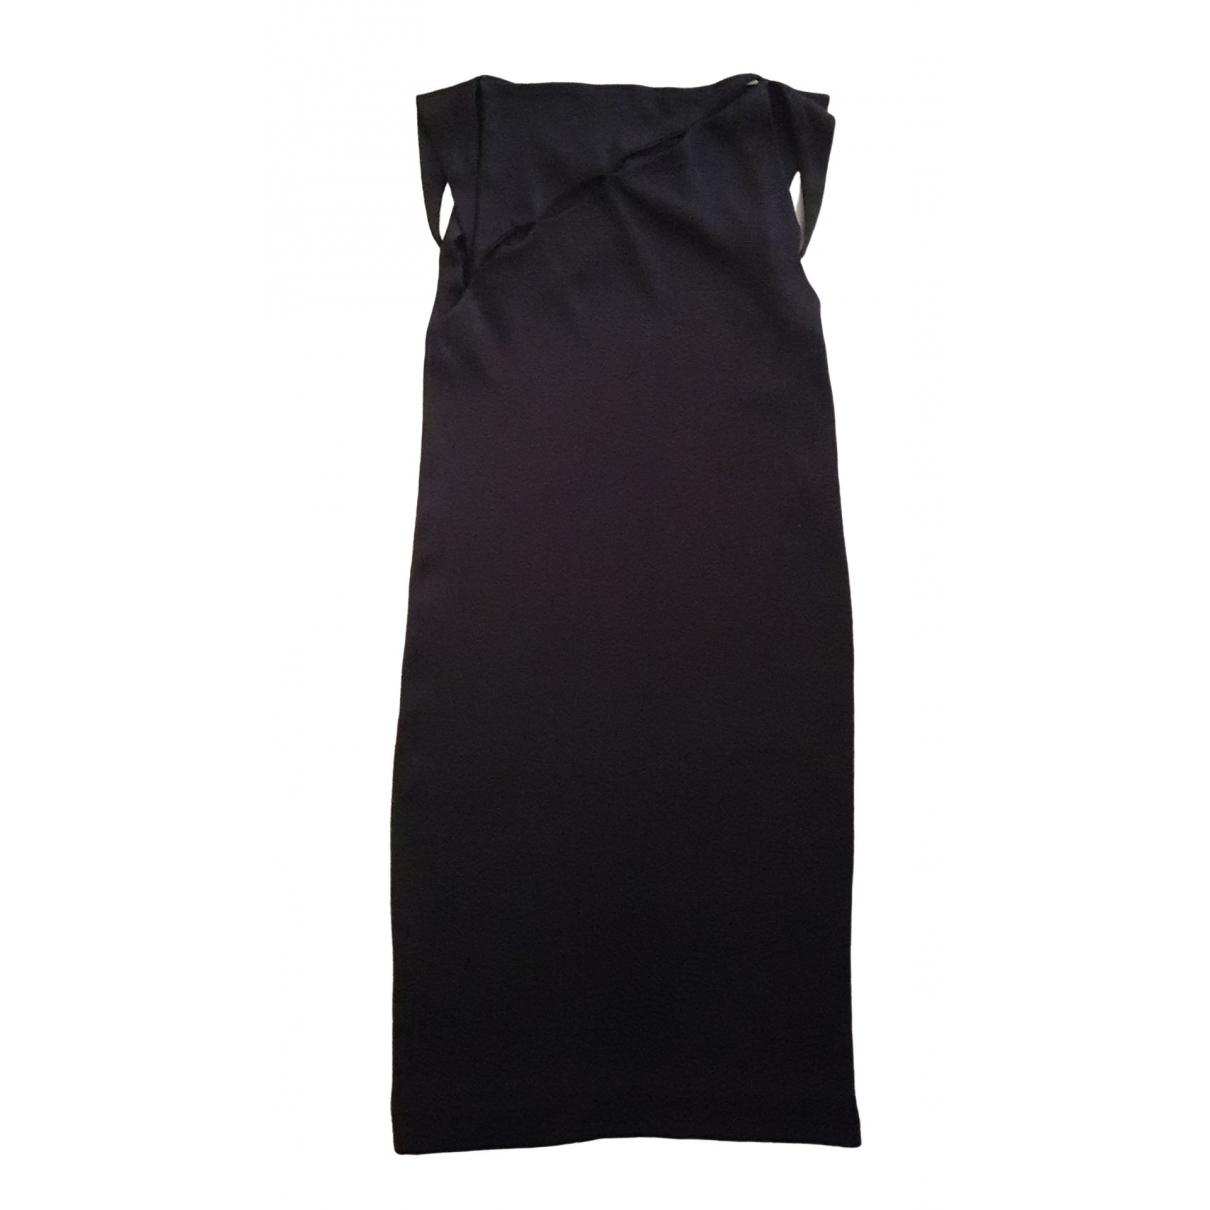 Bottega Veneta \N Kleid in  Braun Viskose